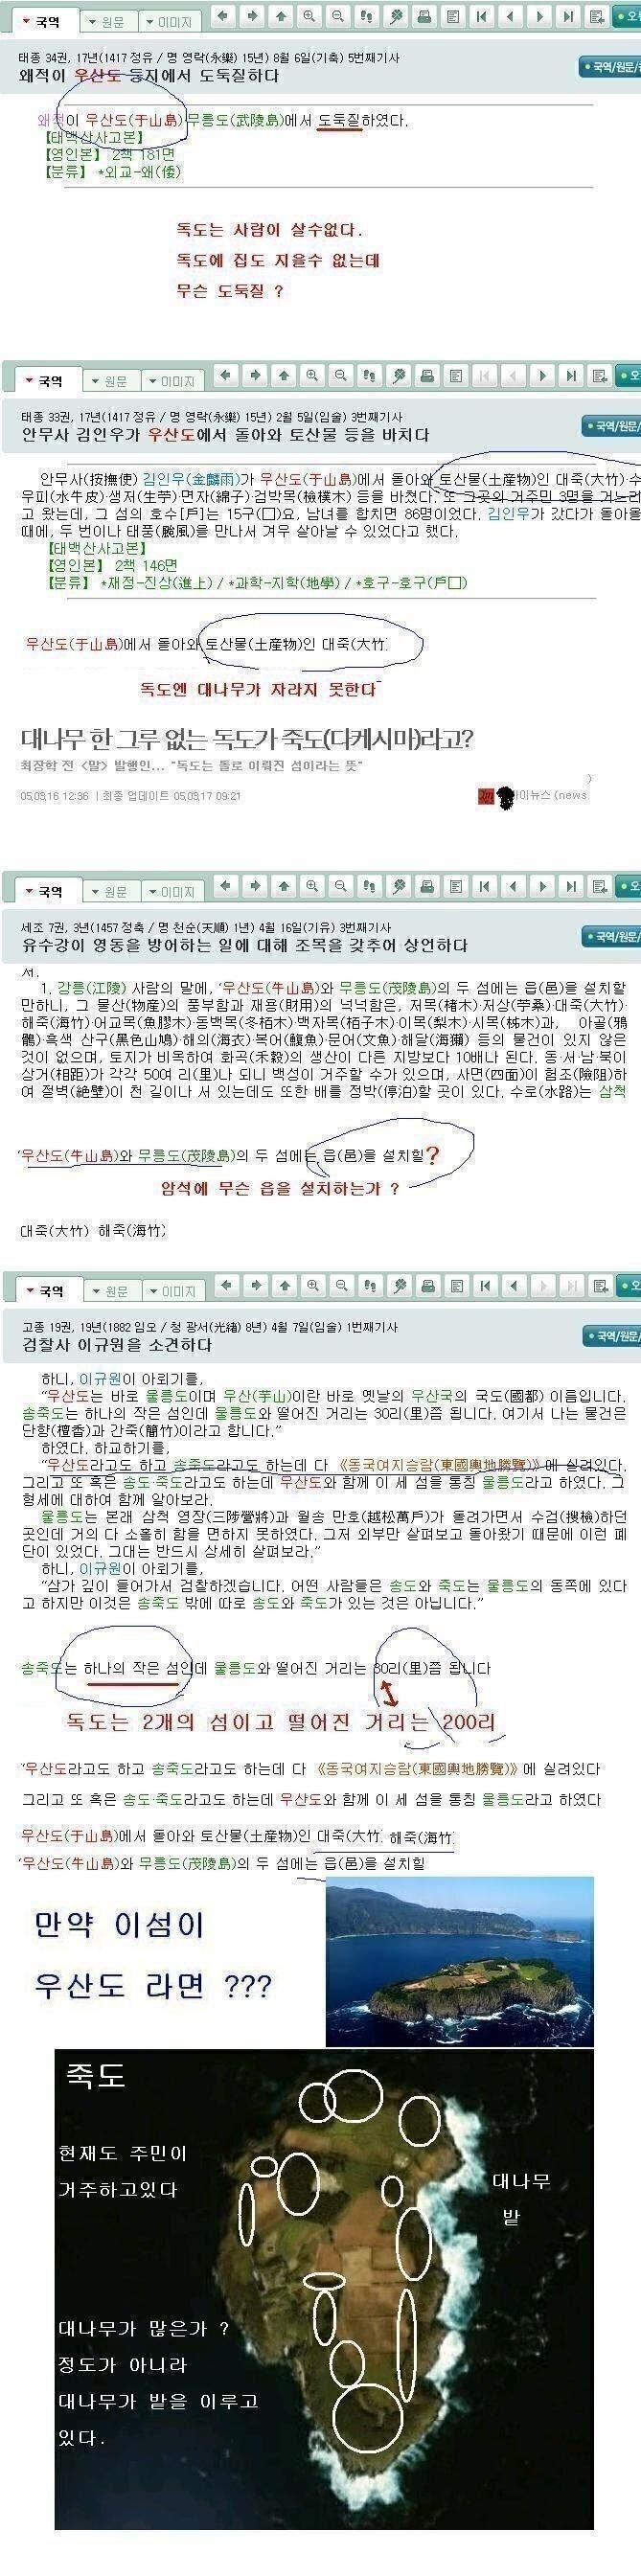 viewimage.php?id=27bcc027ebc1&no=24b0d769e1d32ca73ceb86fa11d02831eebc6c37c2fa034916fac403202405e0fd5f35ab2a4302d6a340631242a7a0f27abda8735cf563af388e0b5cface85458bf37b2114